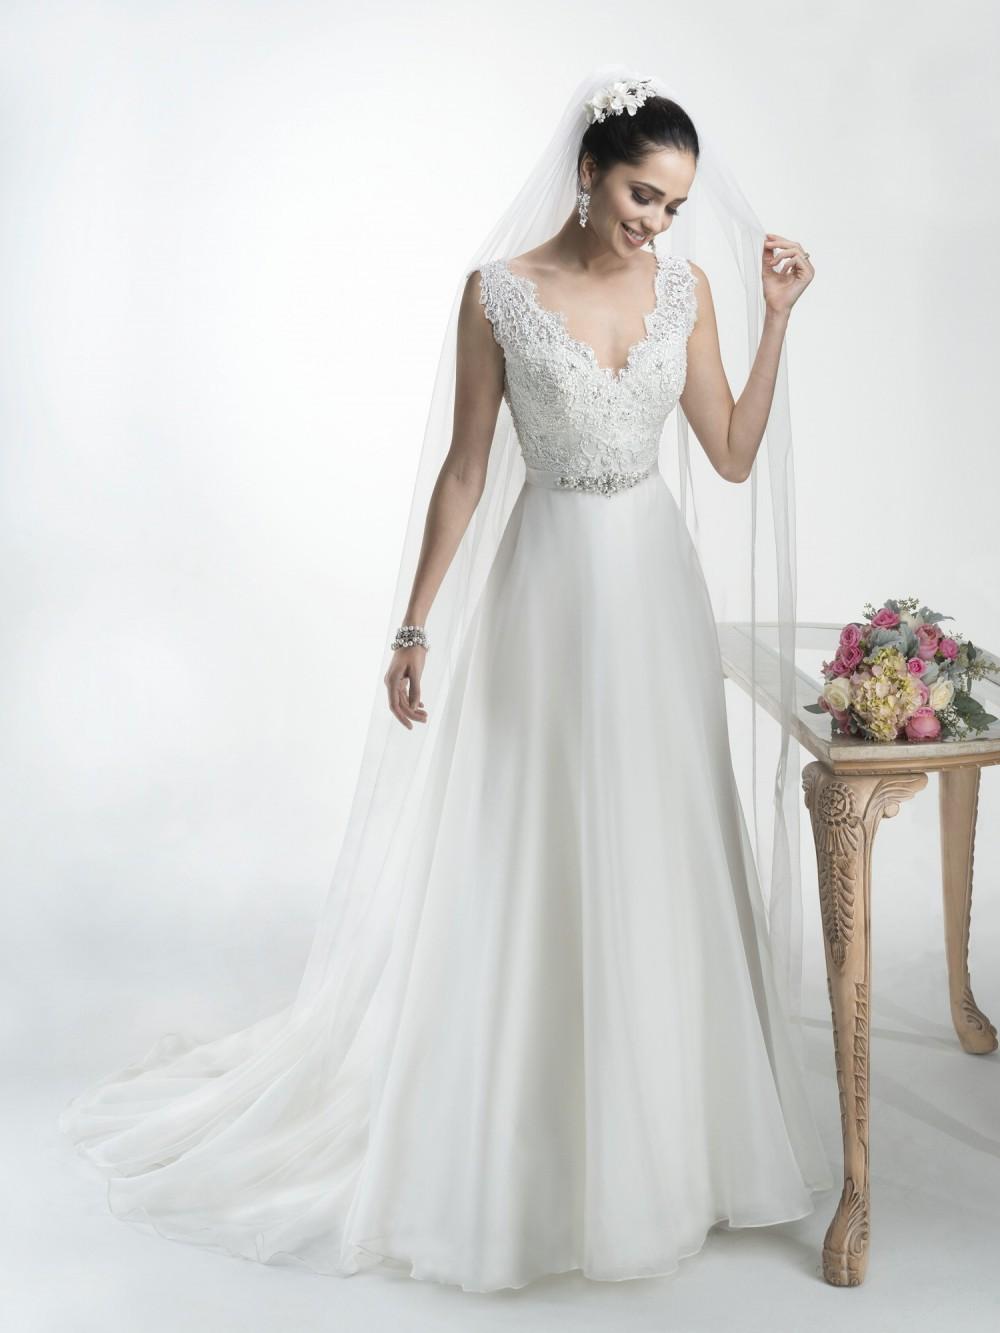 HD wallpapers plus size wedding dress stores in edmonton